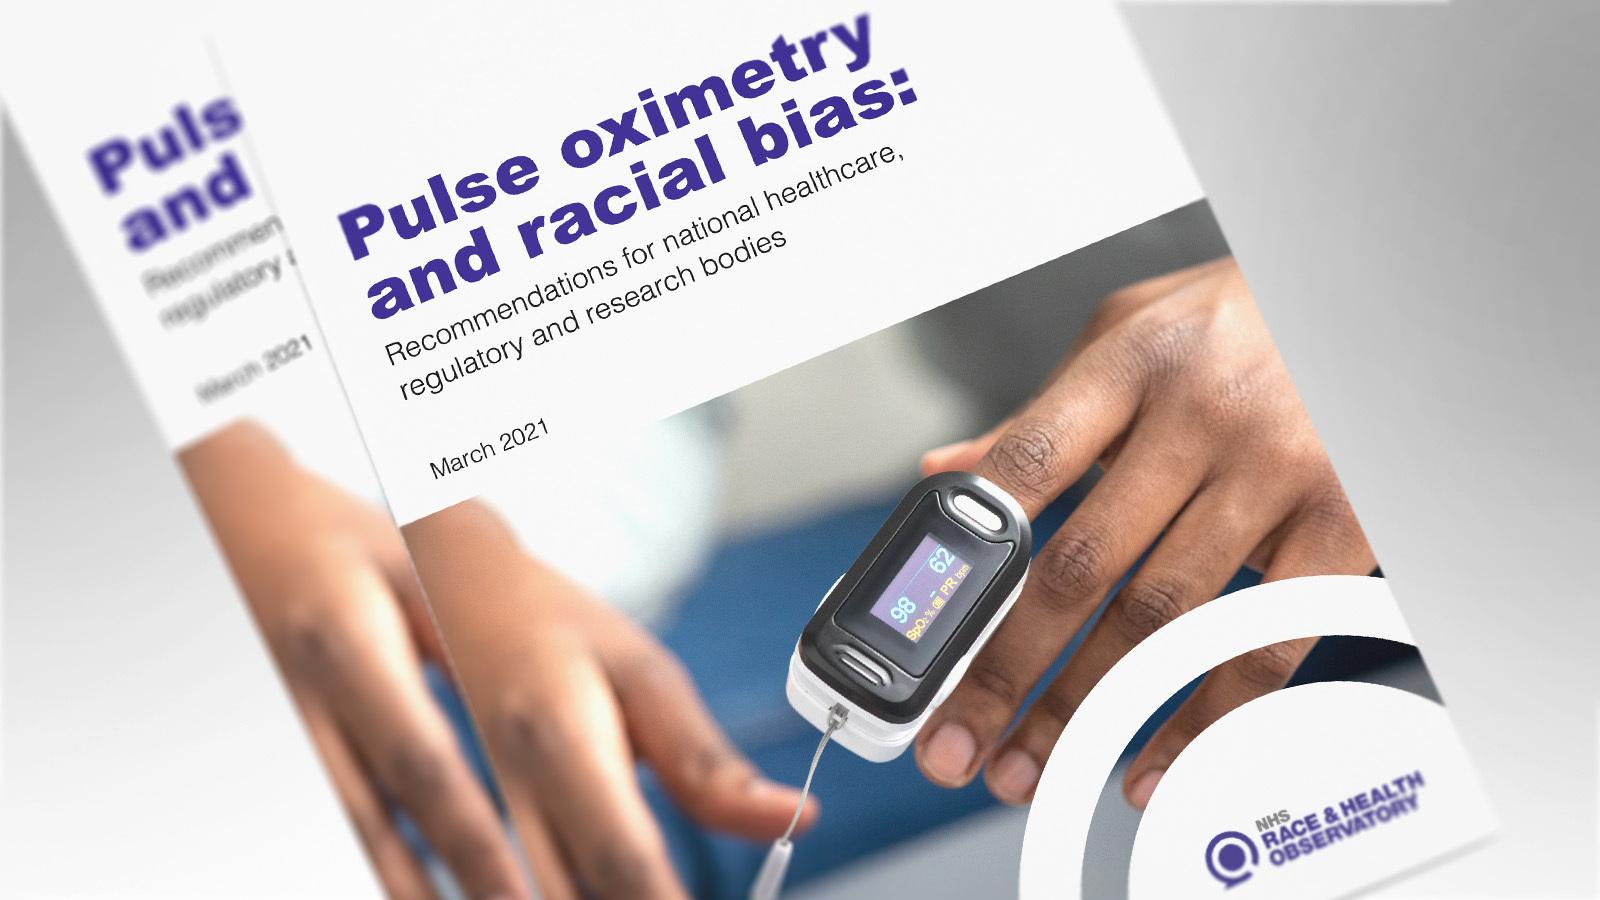 PULSE OXIMETER AND RACIAL BIAS